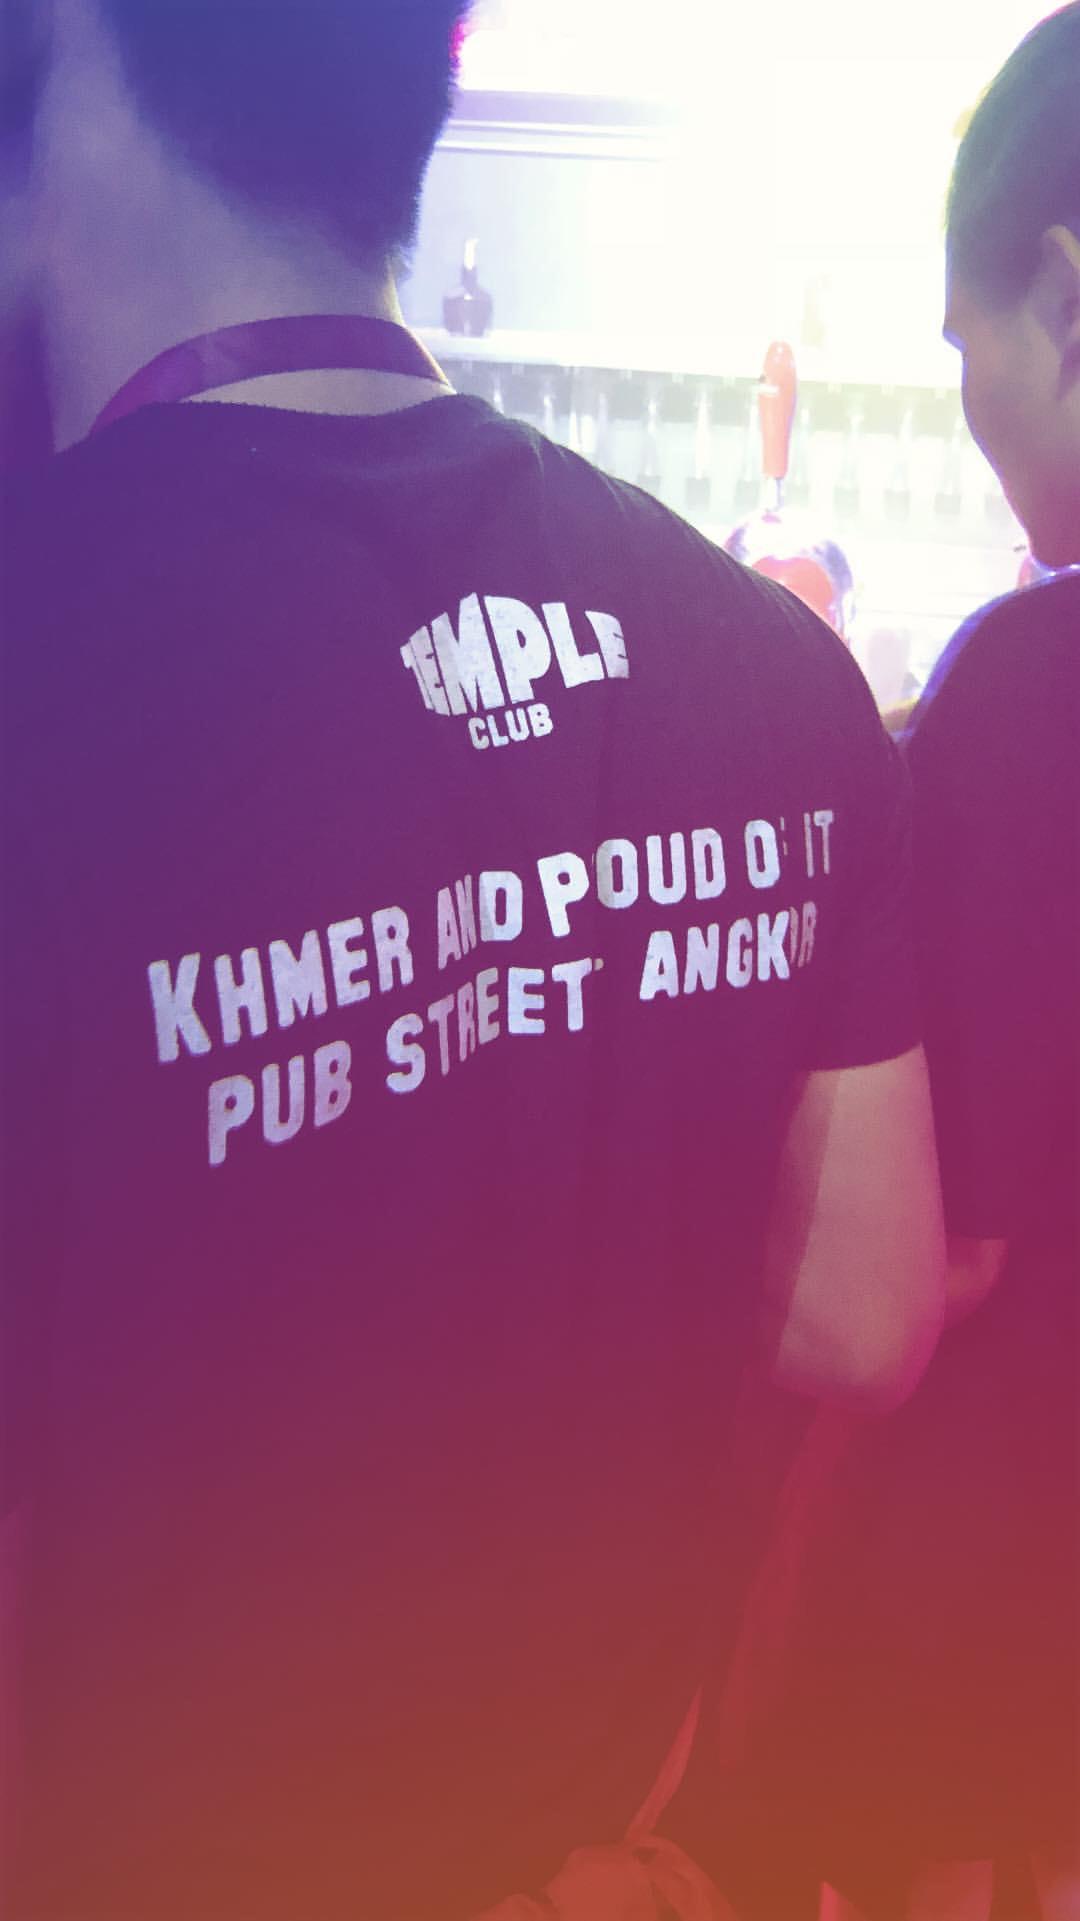 Khmer Kingdom Pride